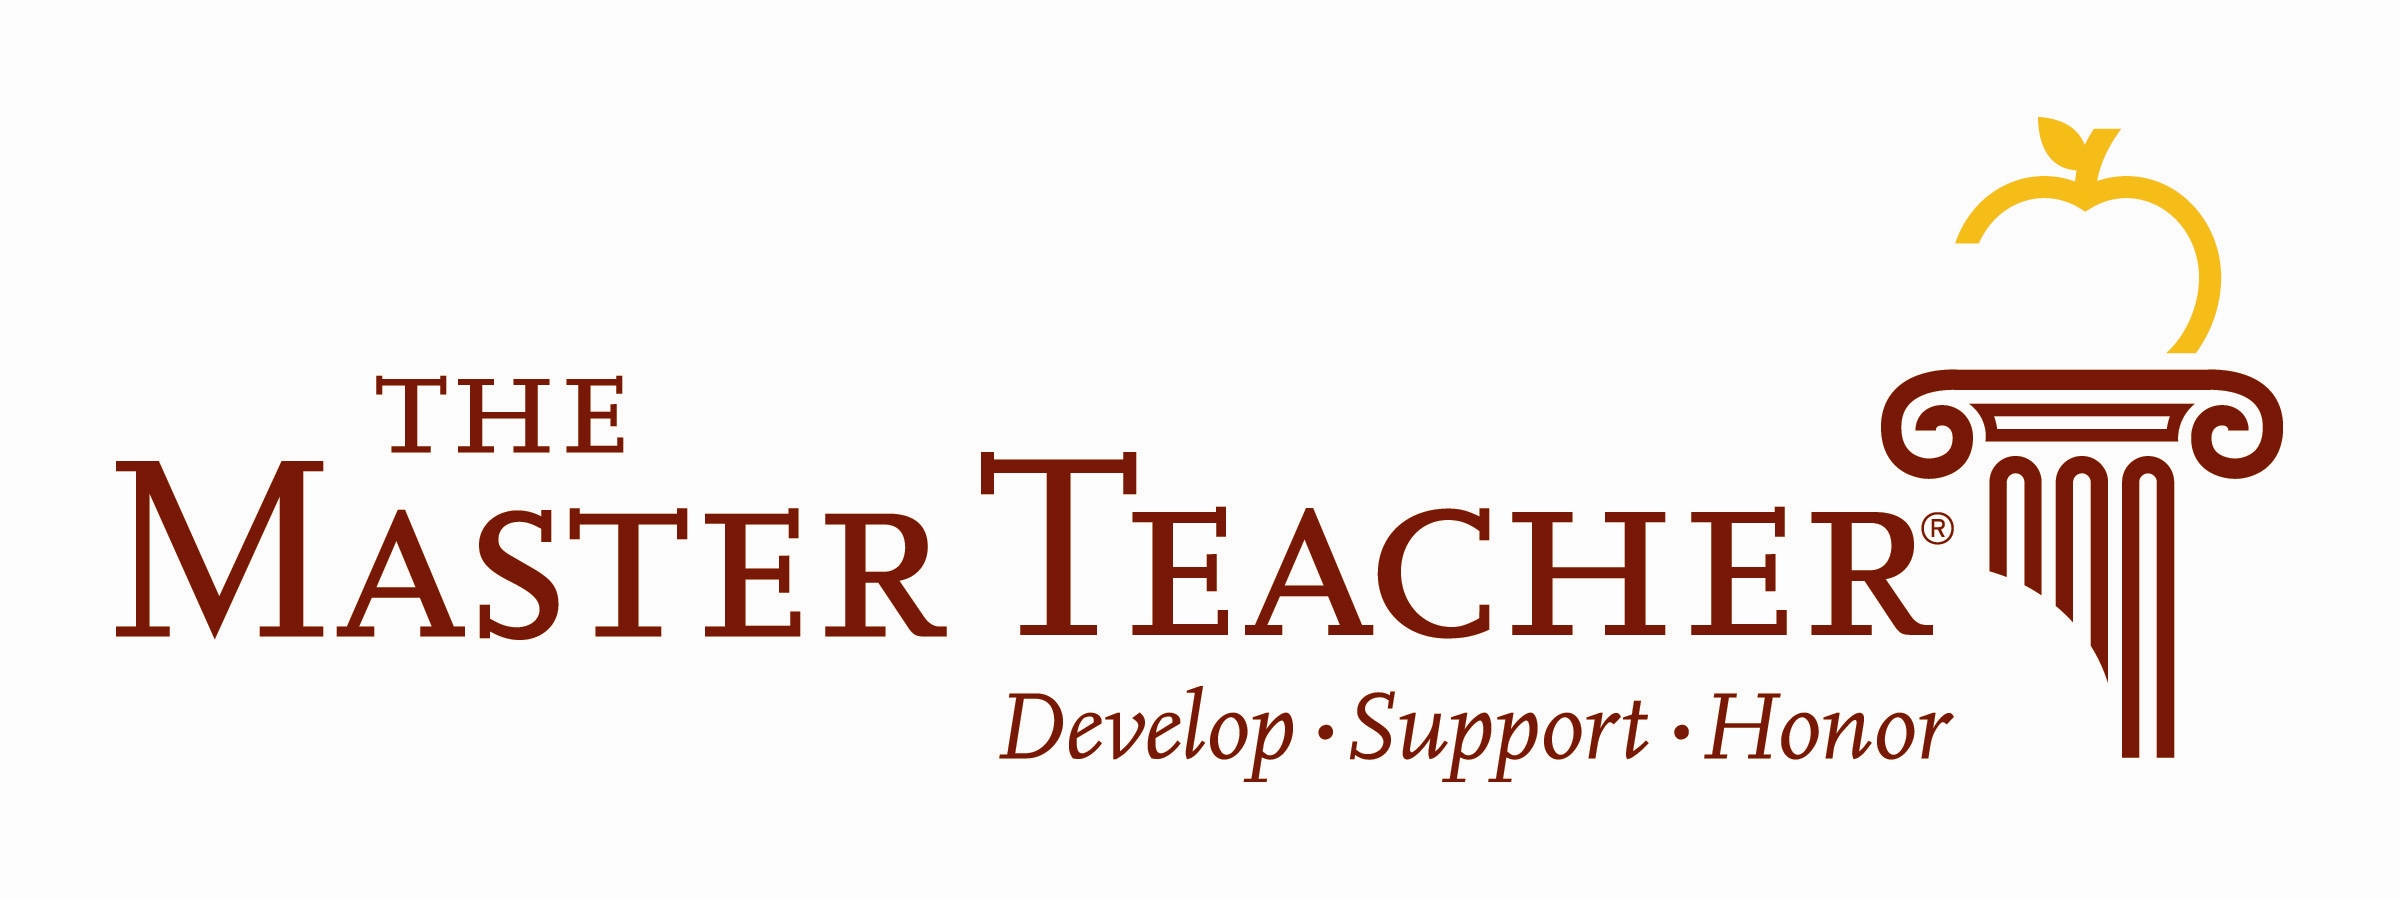 Teacher autism certificate 1betcityfo Gallery